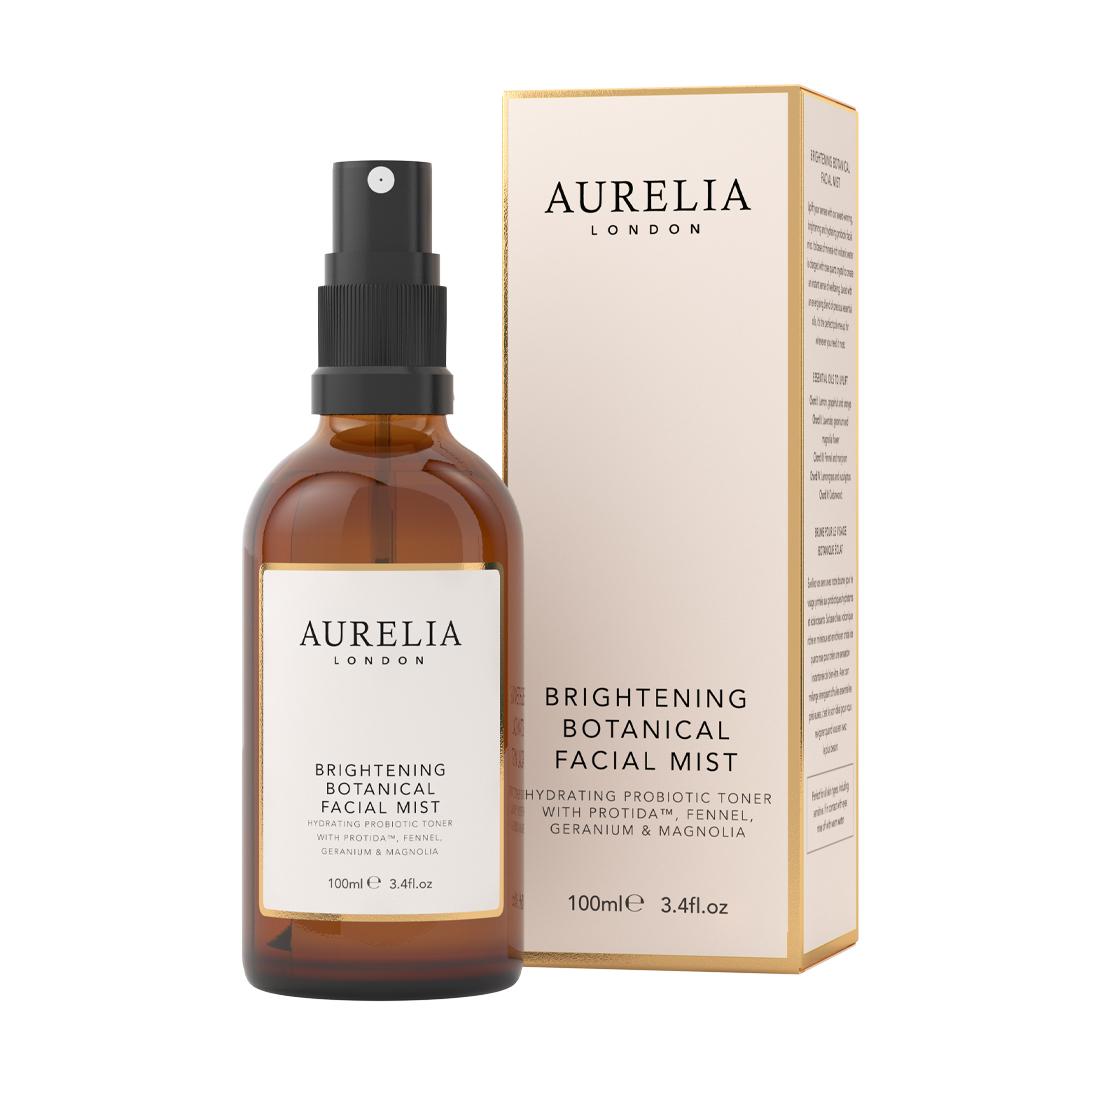 An image of Brightening Botanical Facial Mist 100ml Aurelia London